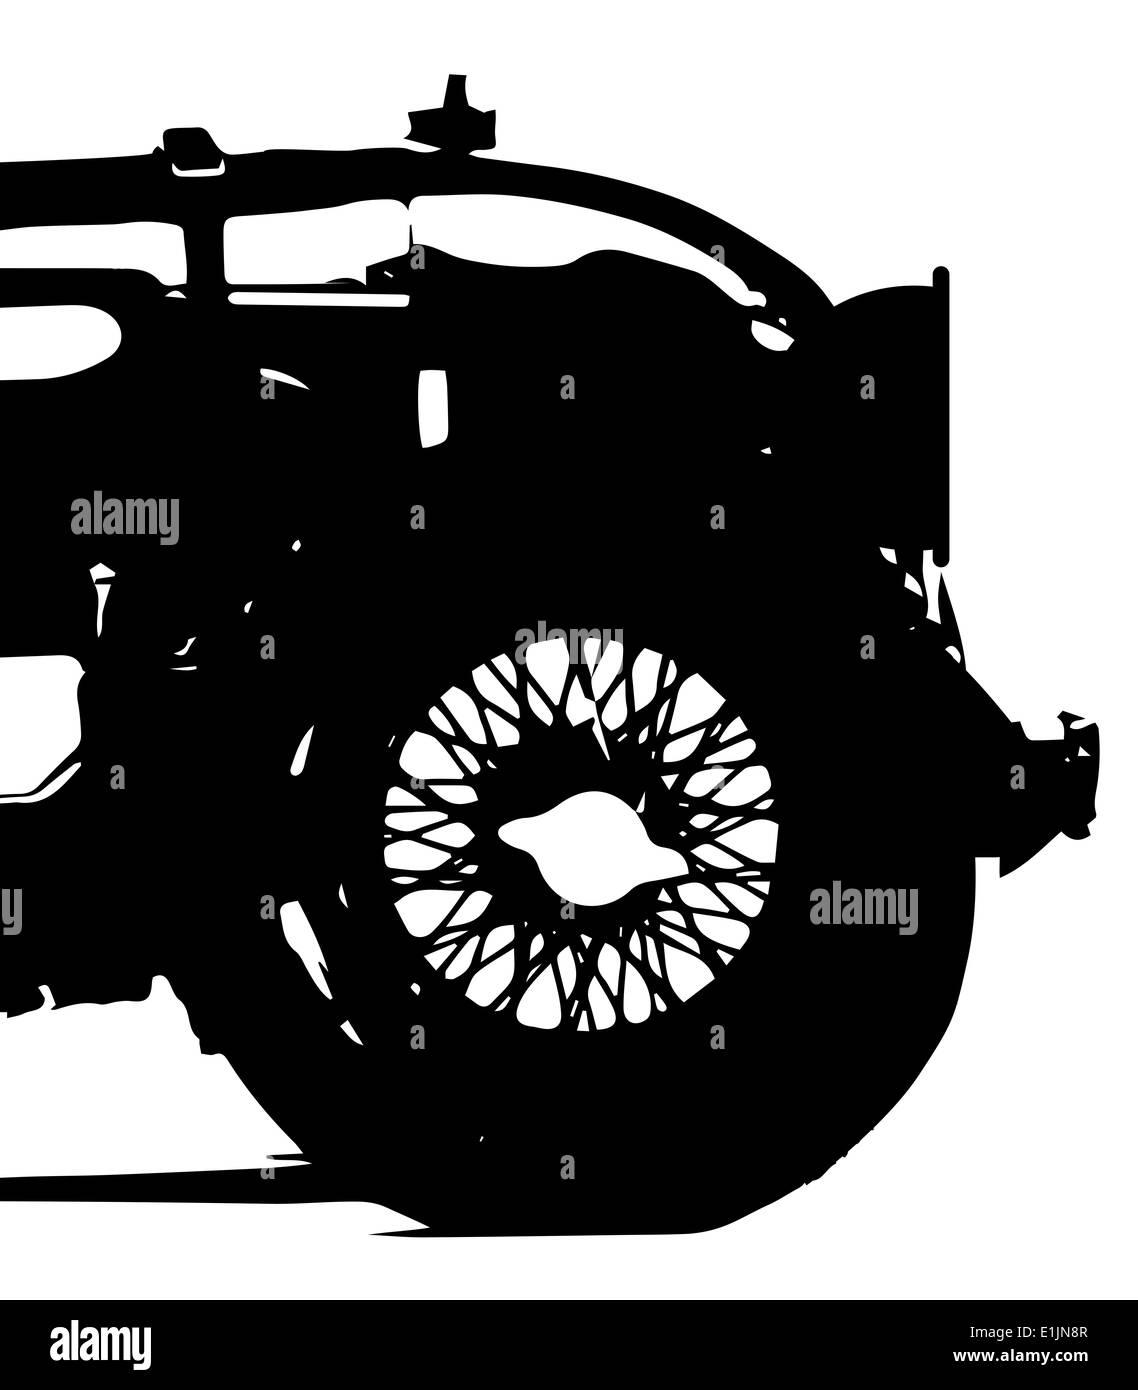 Fein Draht Nabe Fotos - Schaltplan Serie Circuit Collection - tollot ...